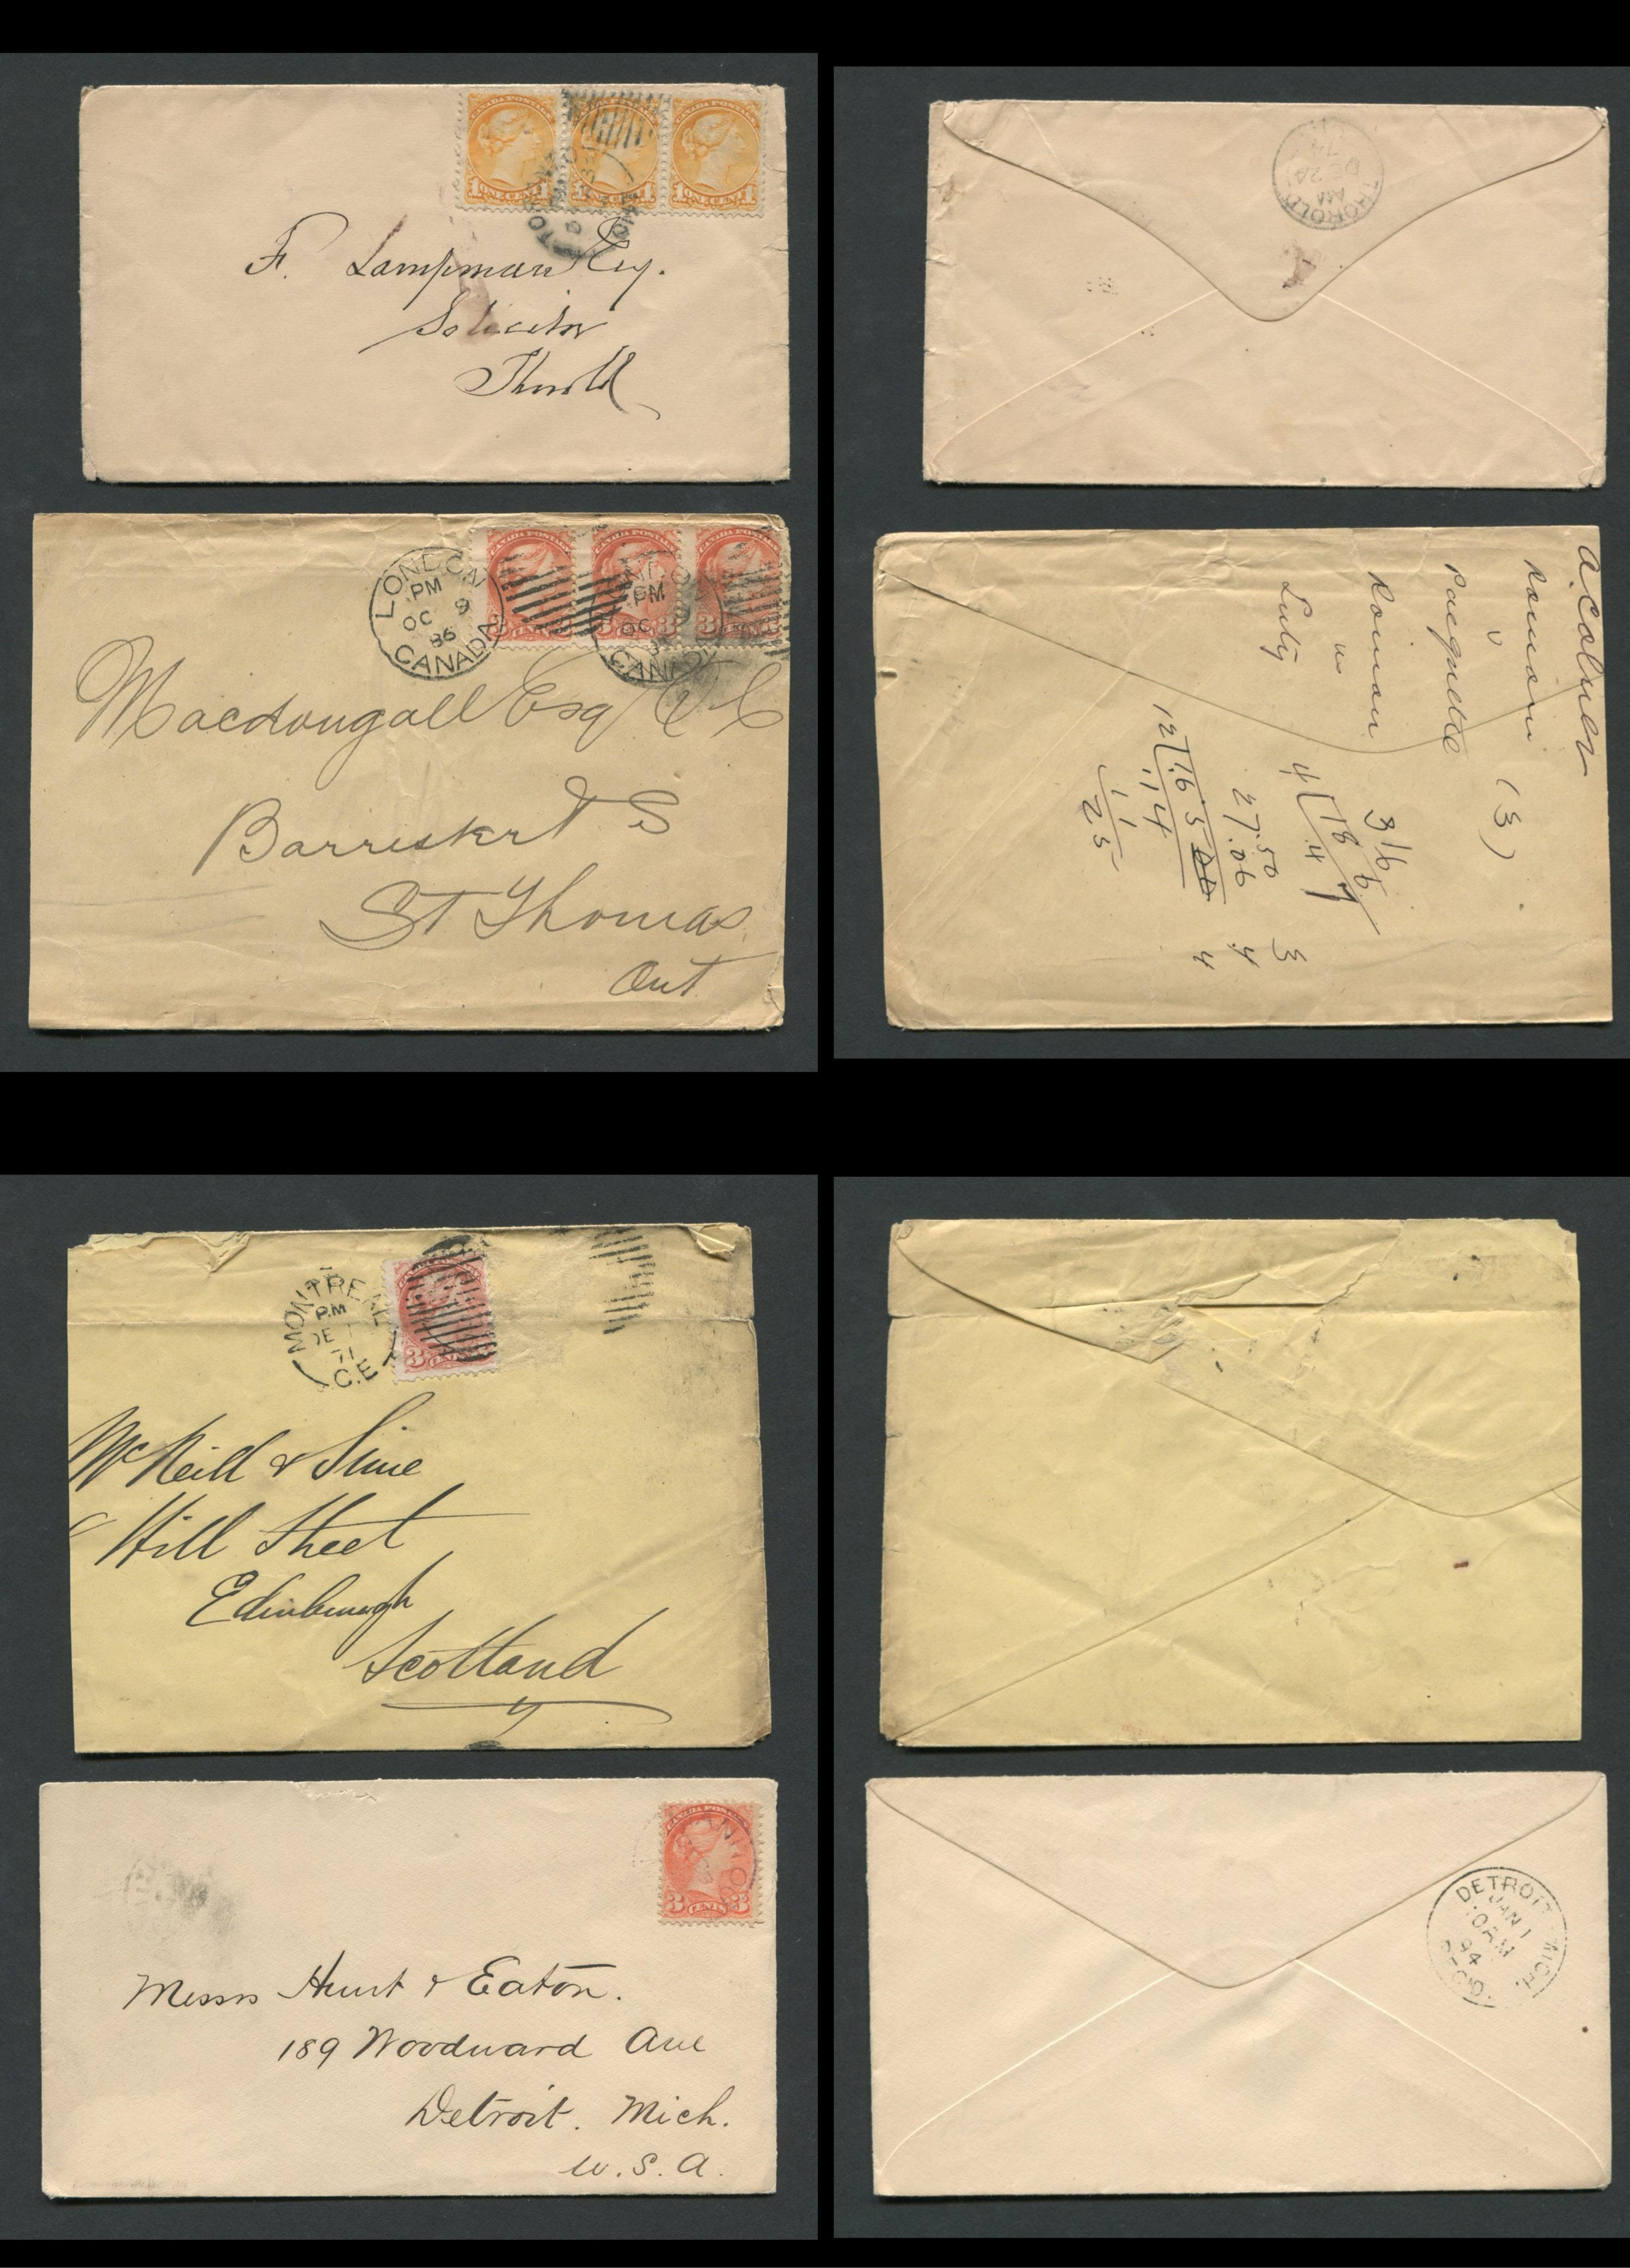 Canada Victoria Stamp Covers 13